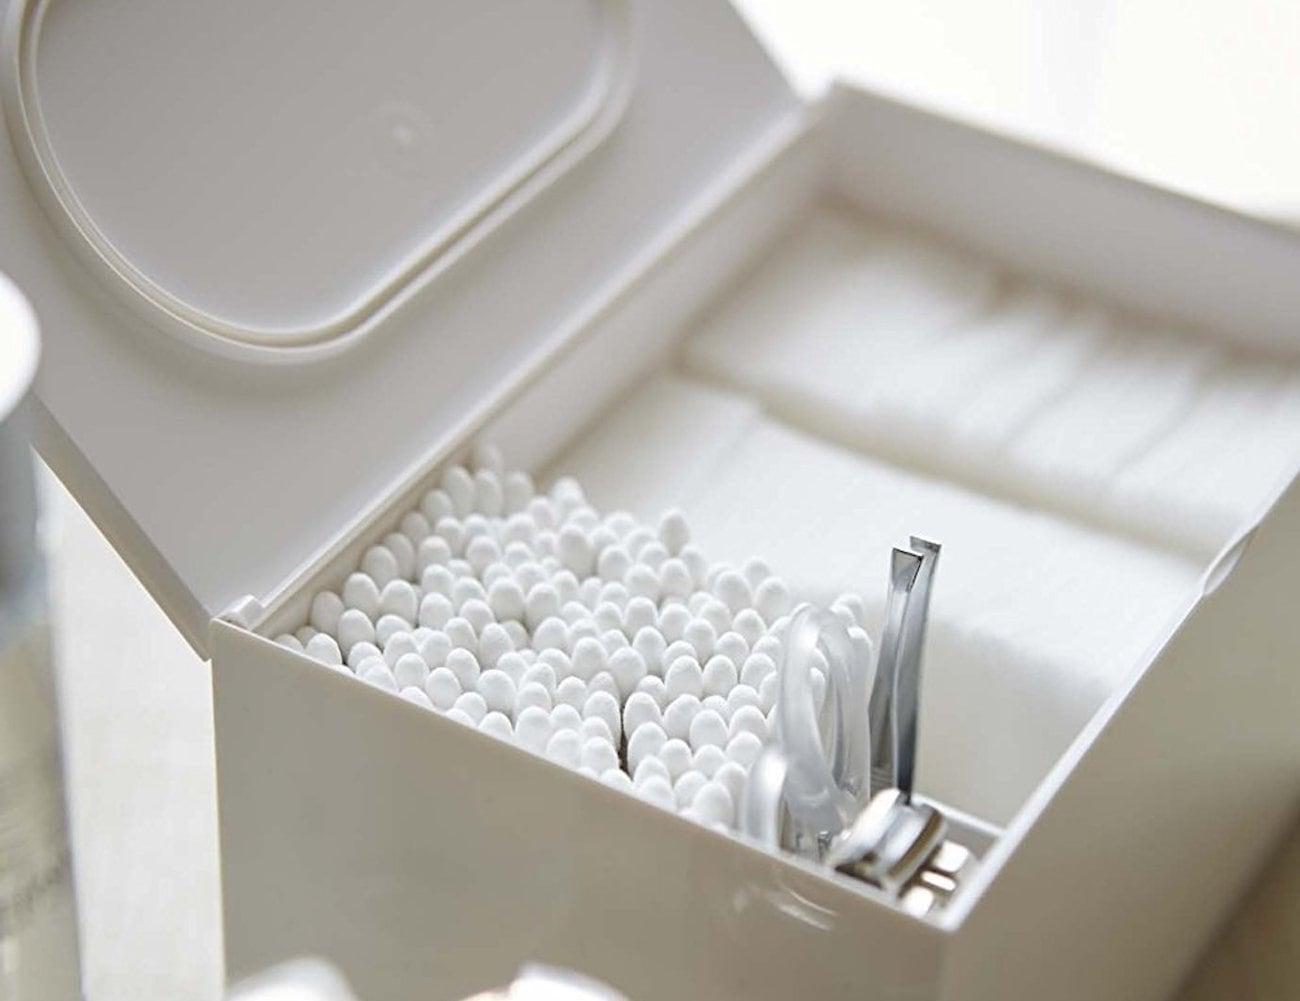 YAMAZAKI Veil Cotton Storage Case